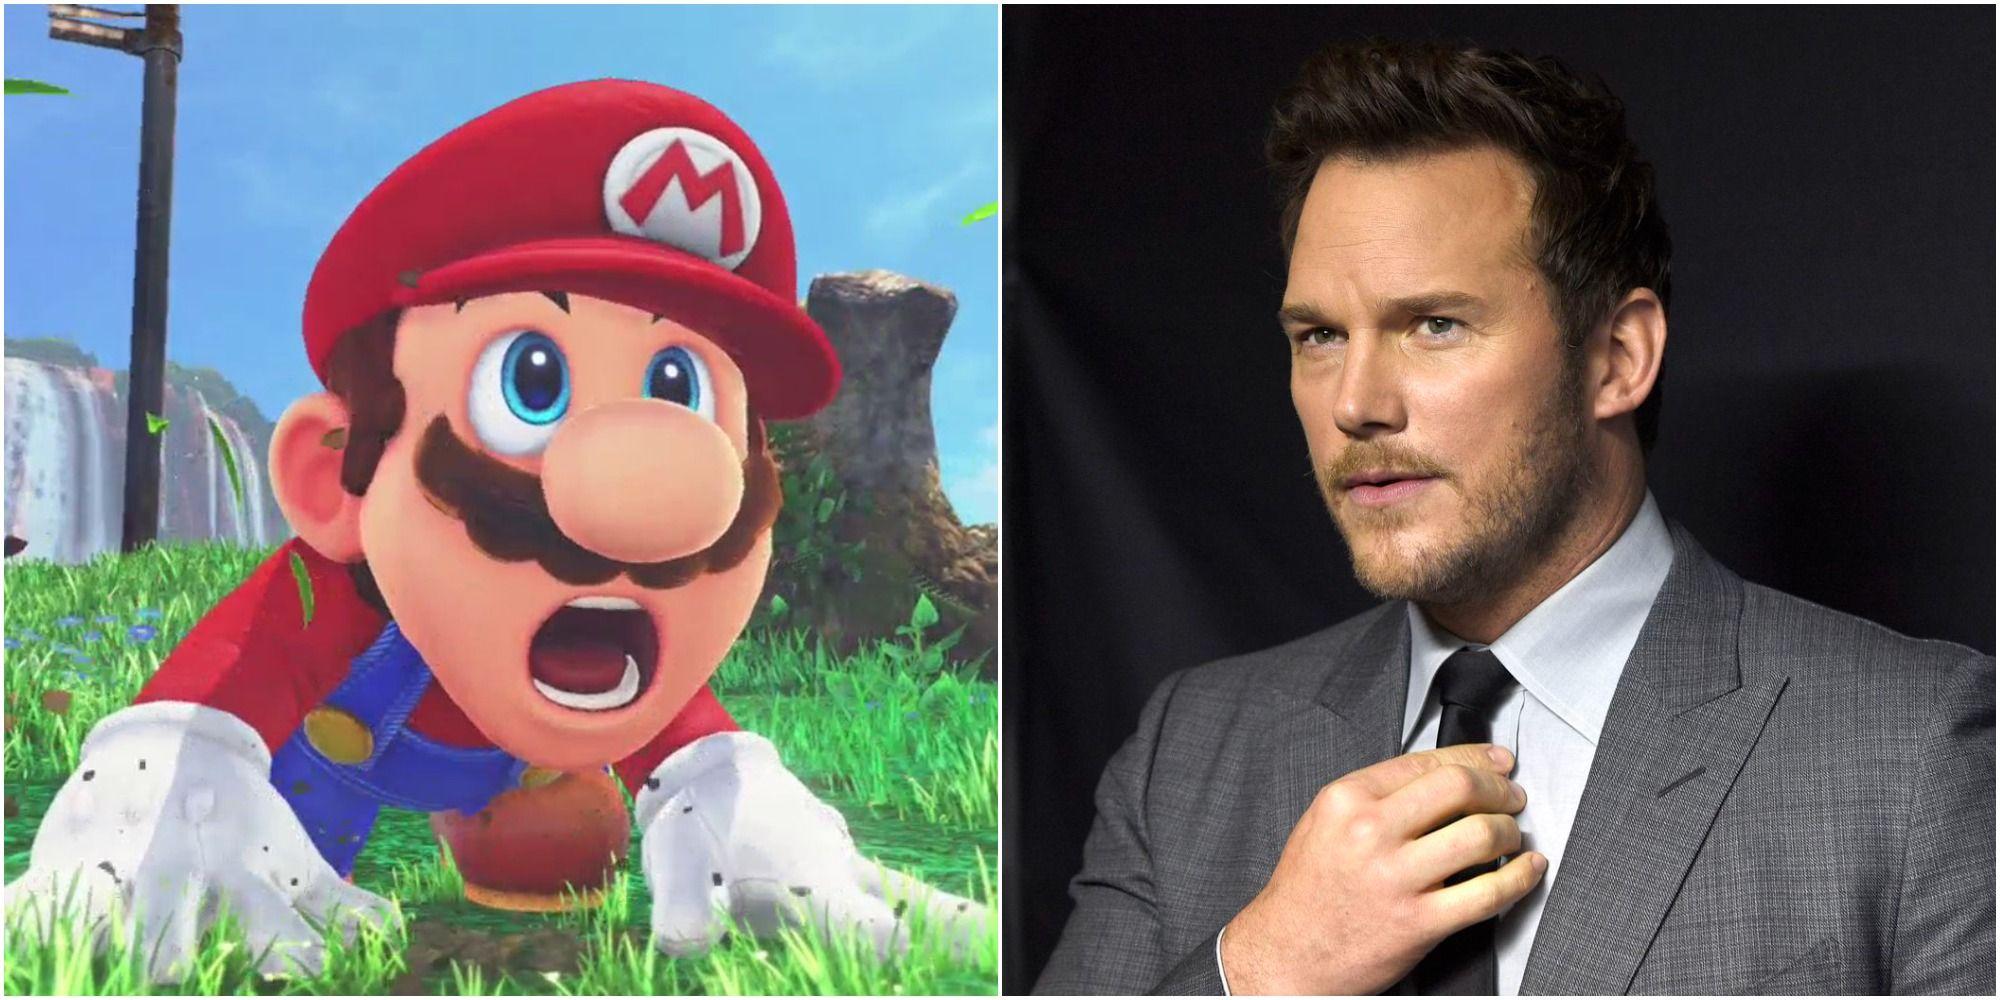 Chris Pratt Mario Casting Was Foretold In 2020